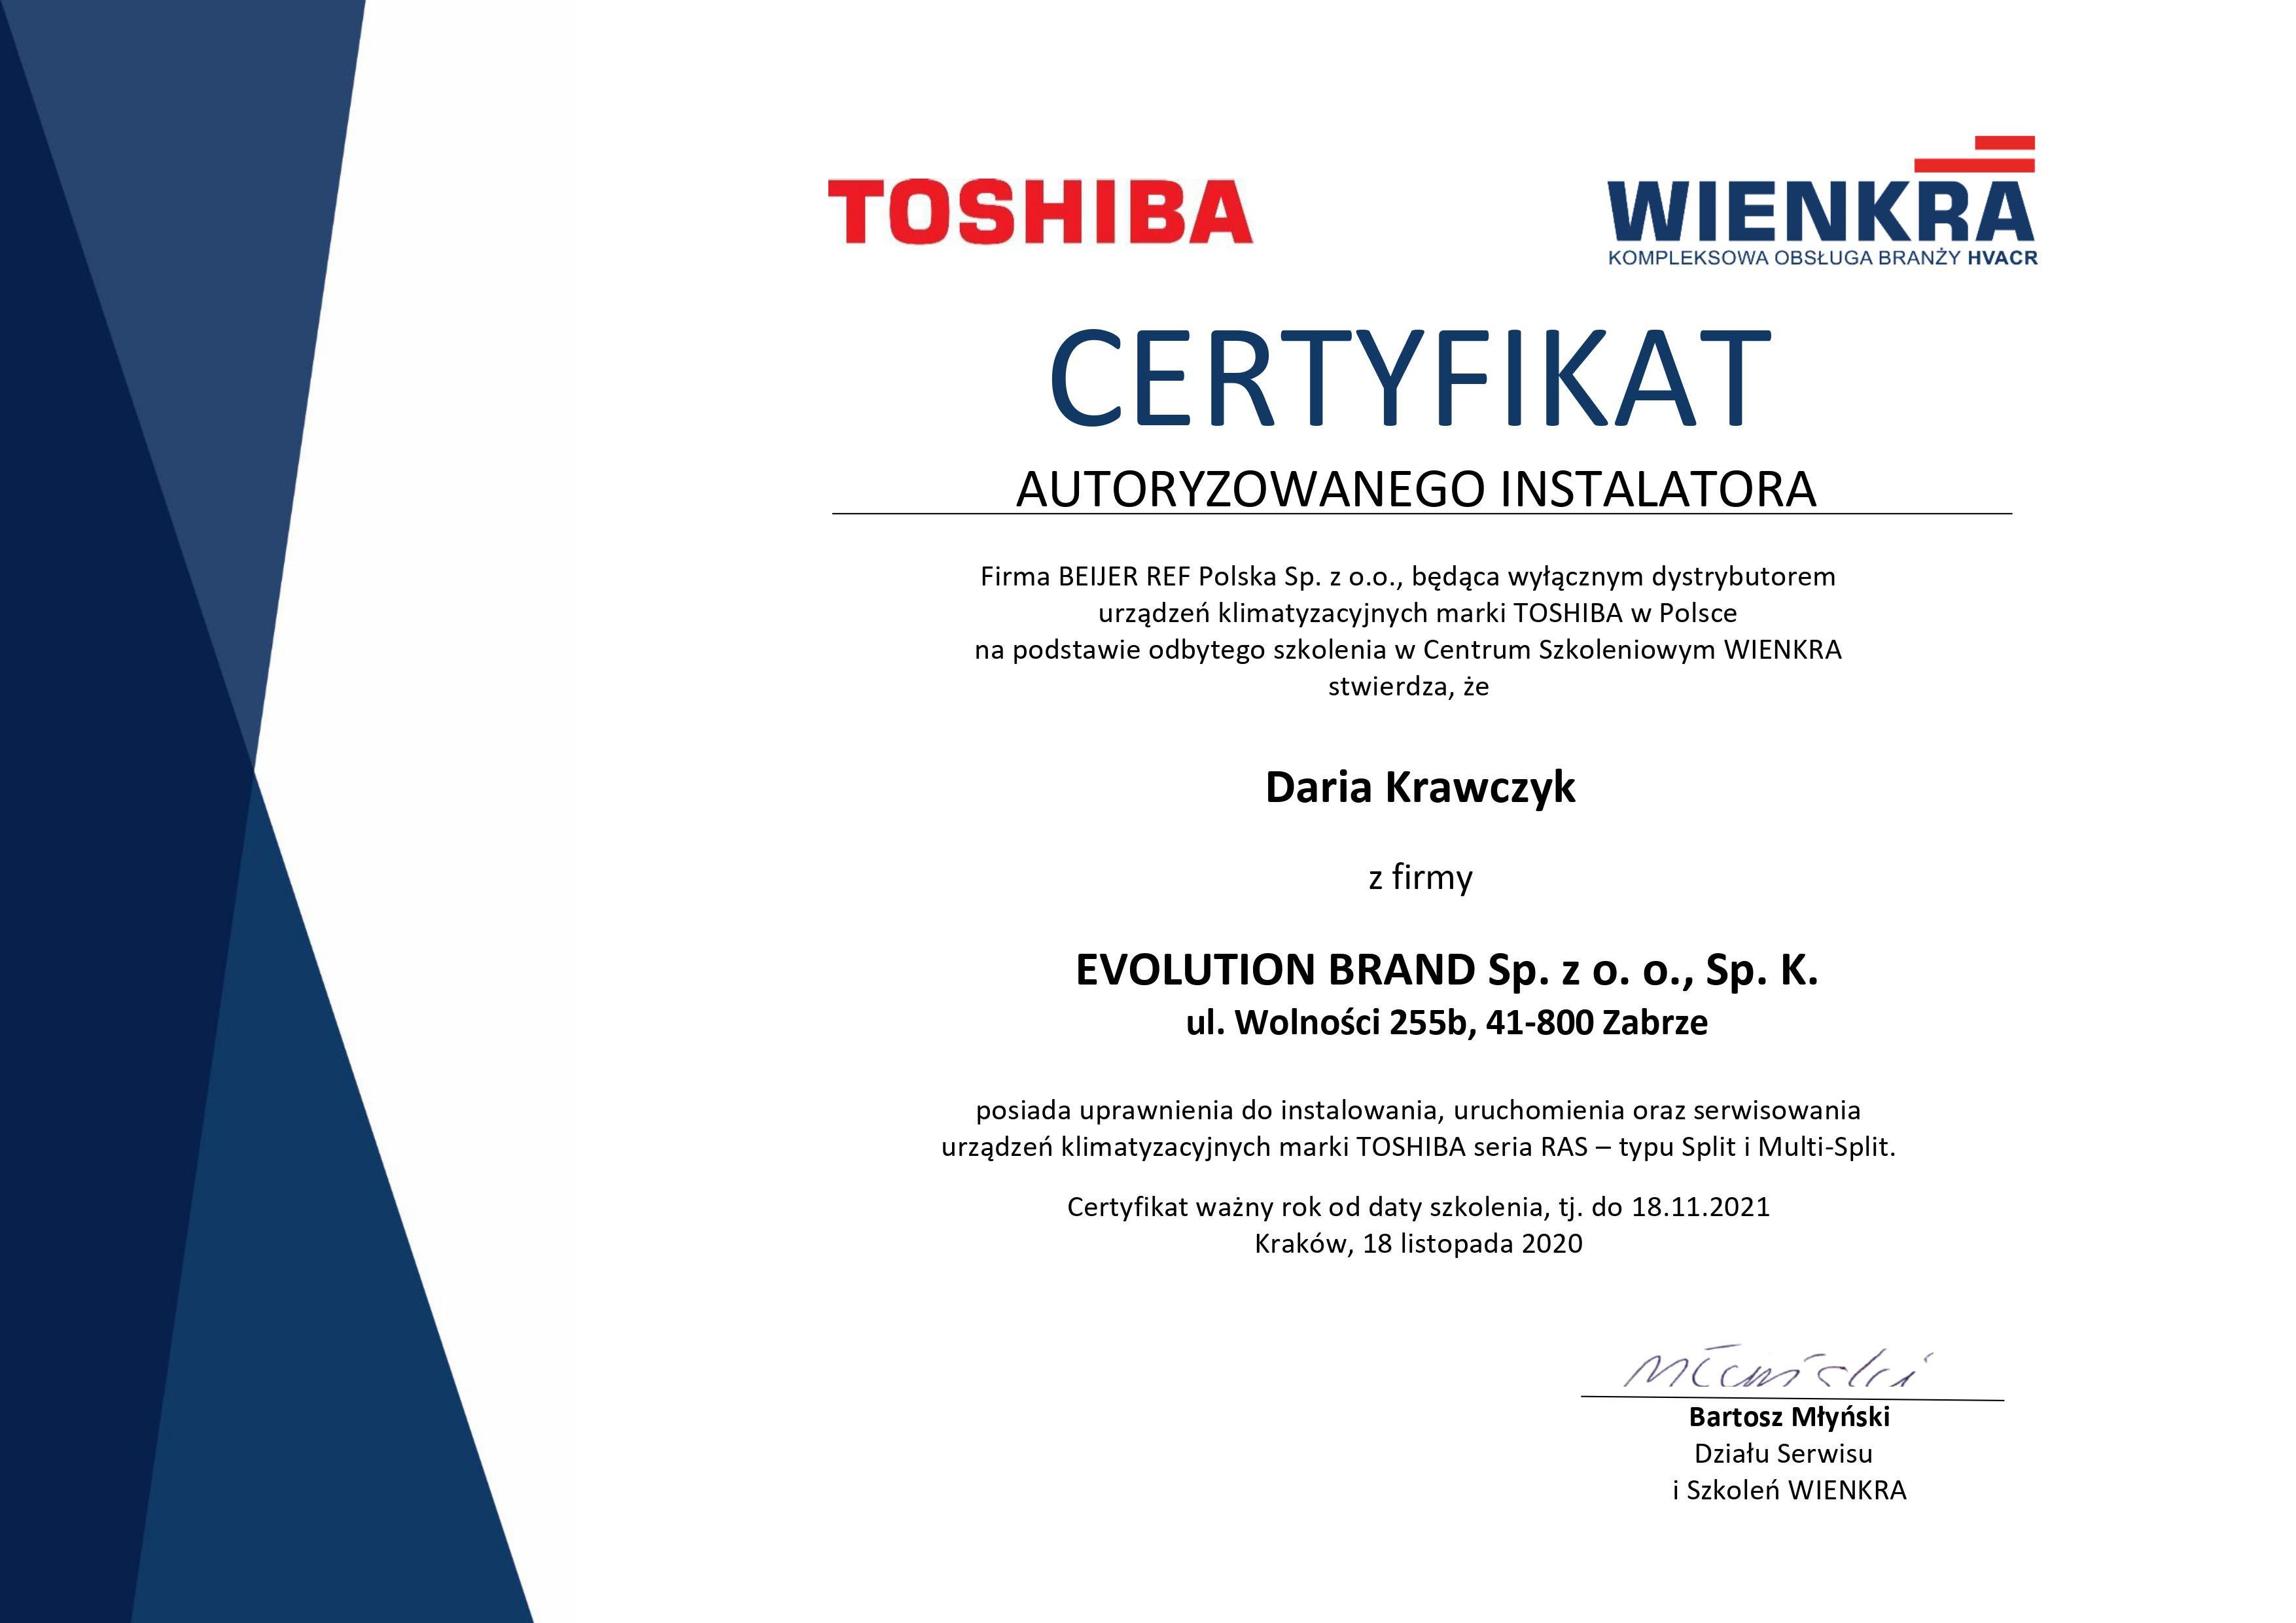 Certyfikat Gree Toshiba 2021